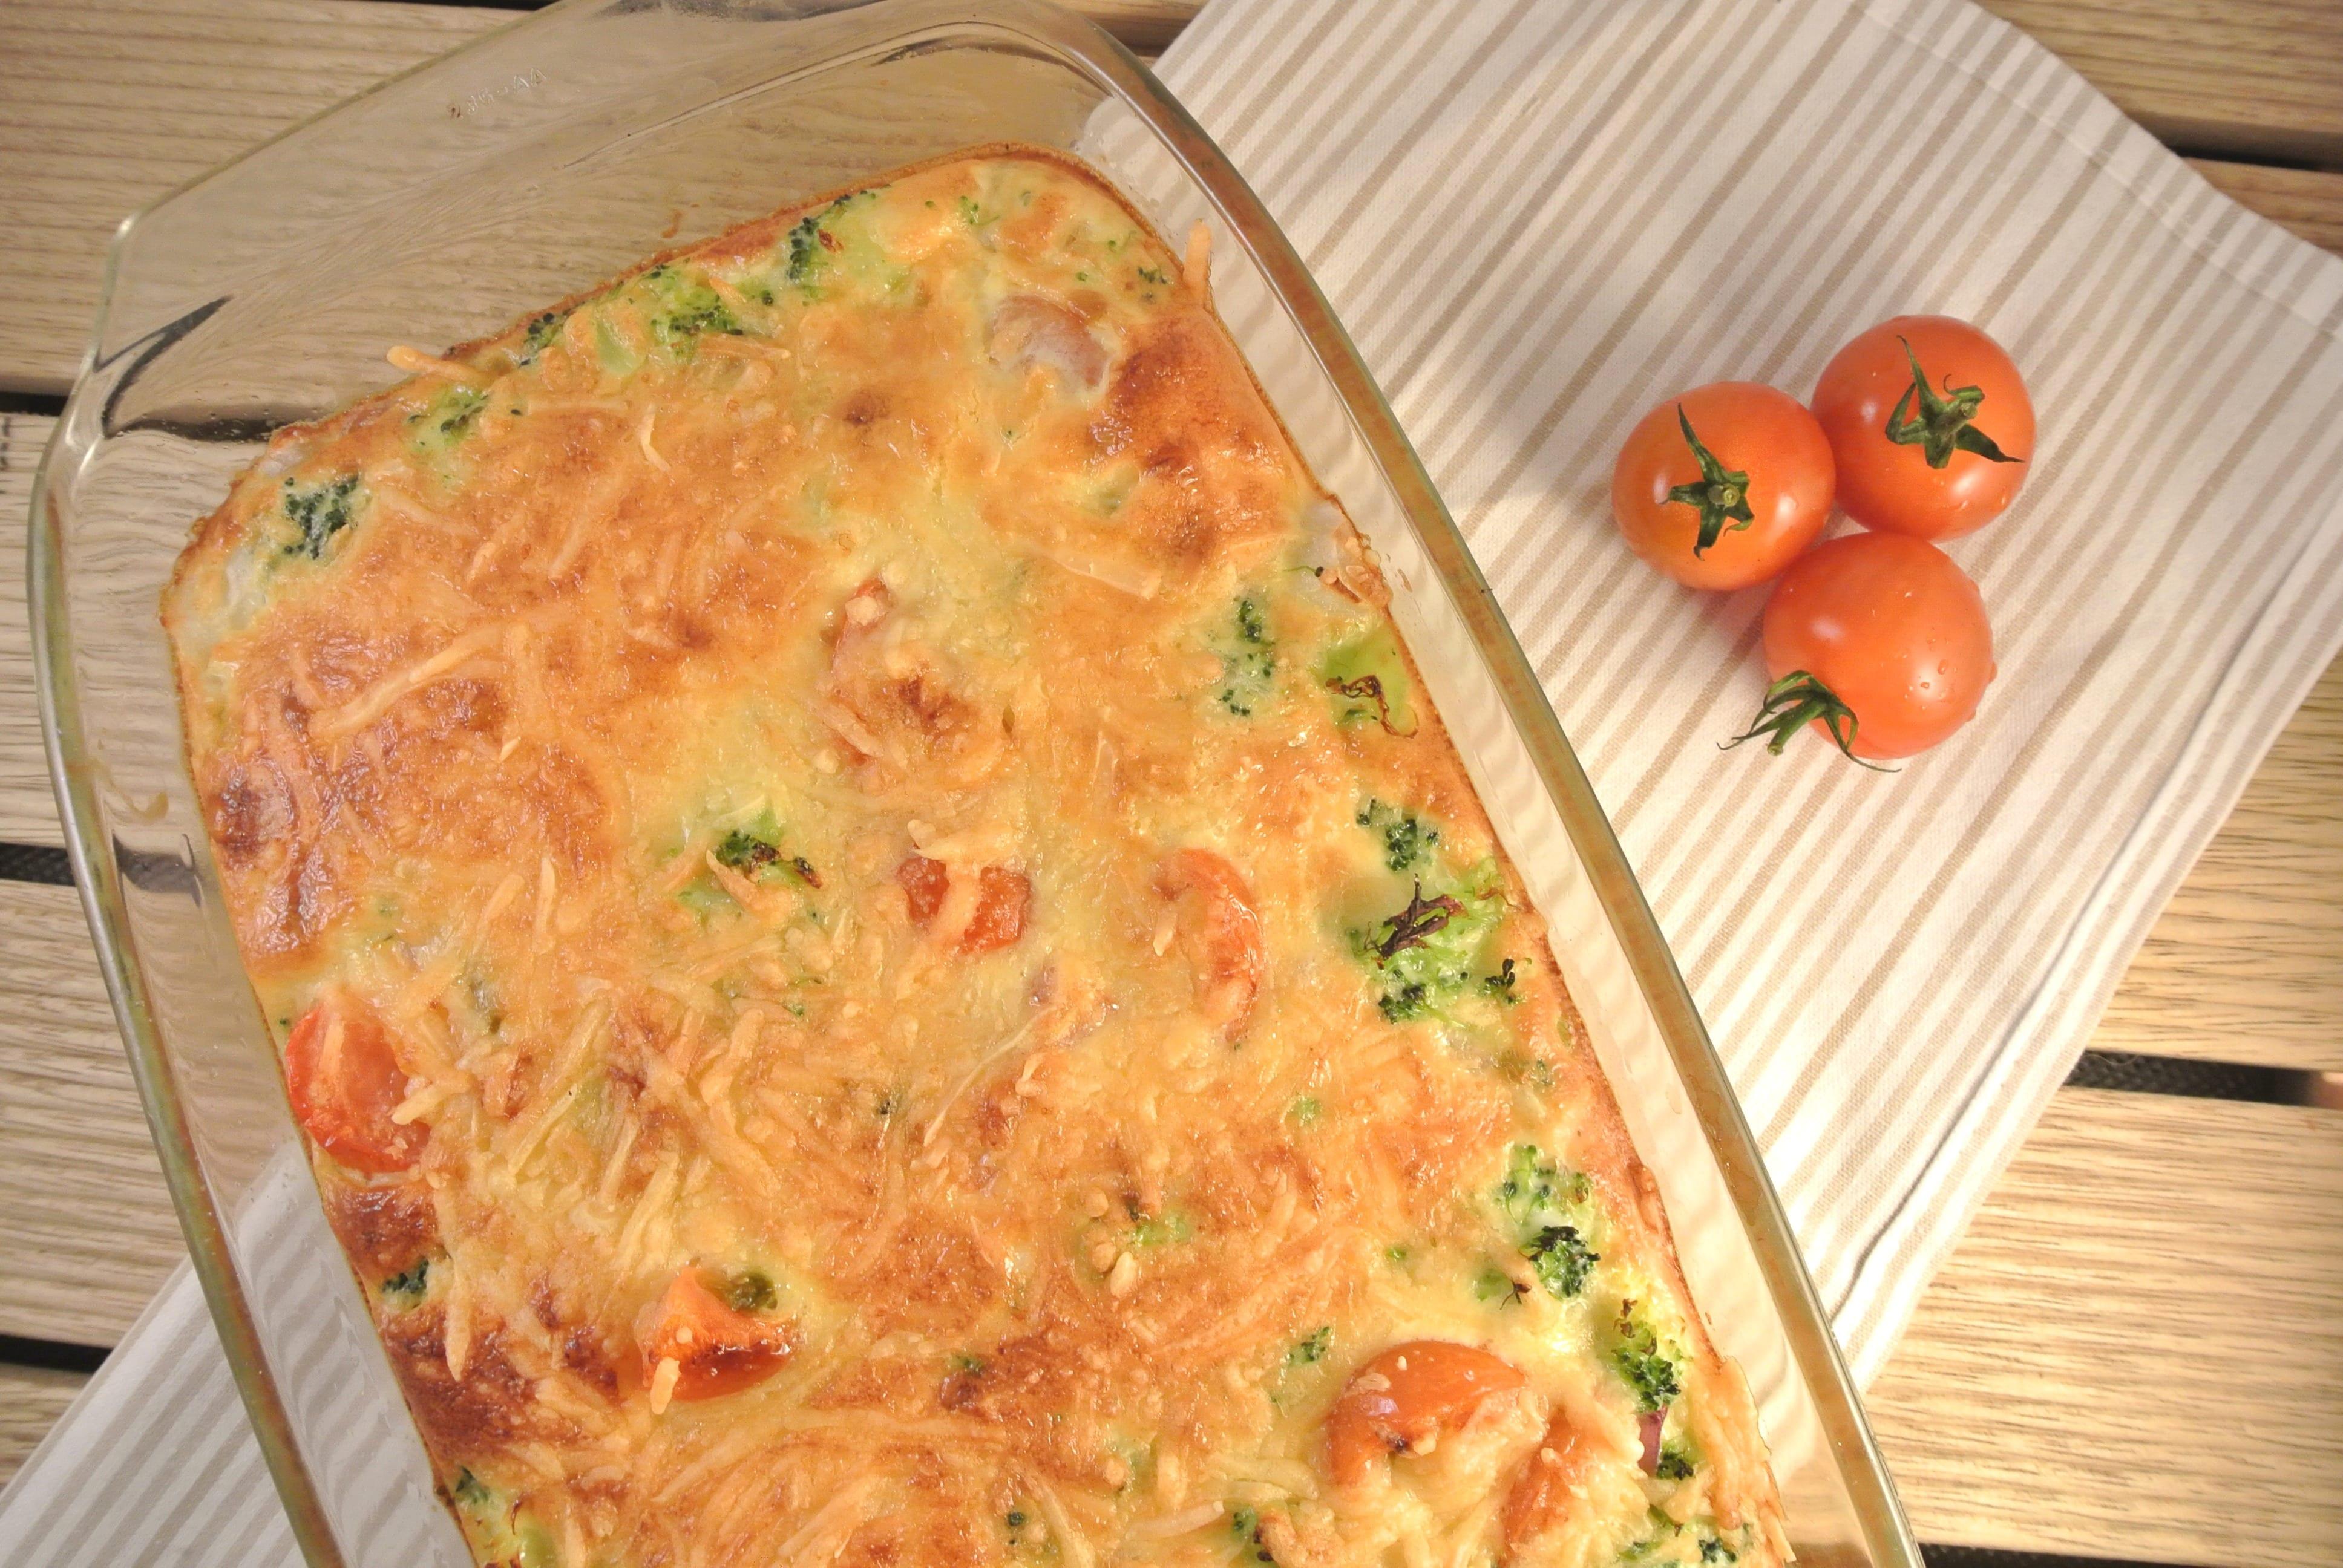 Broccoli frittata uit de oven